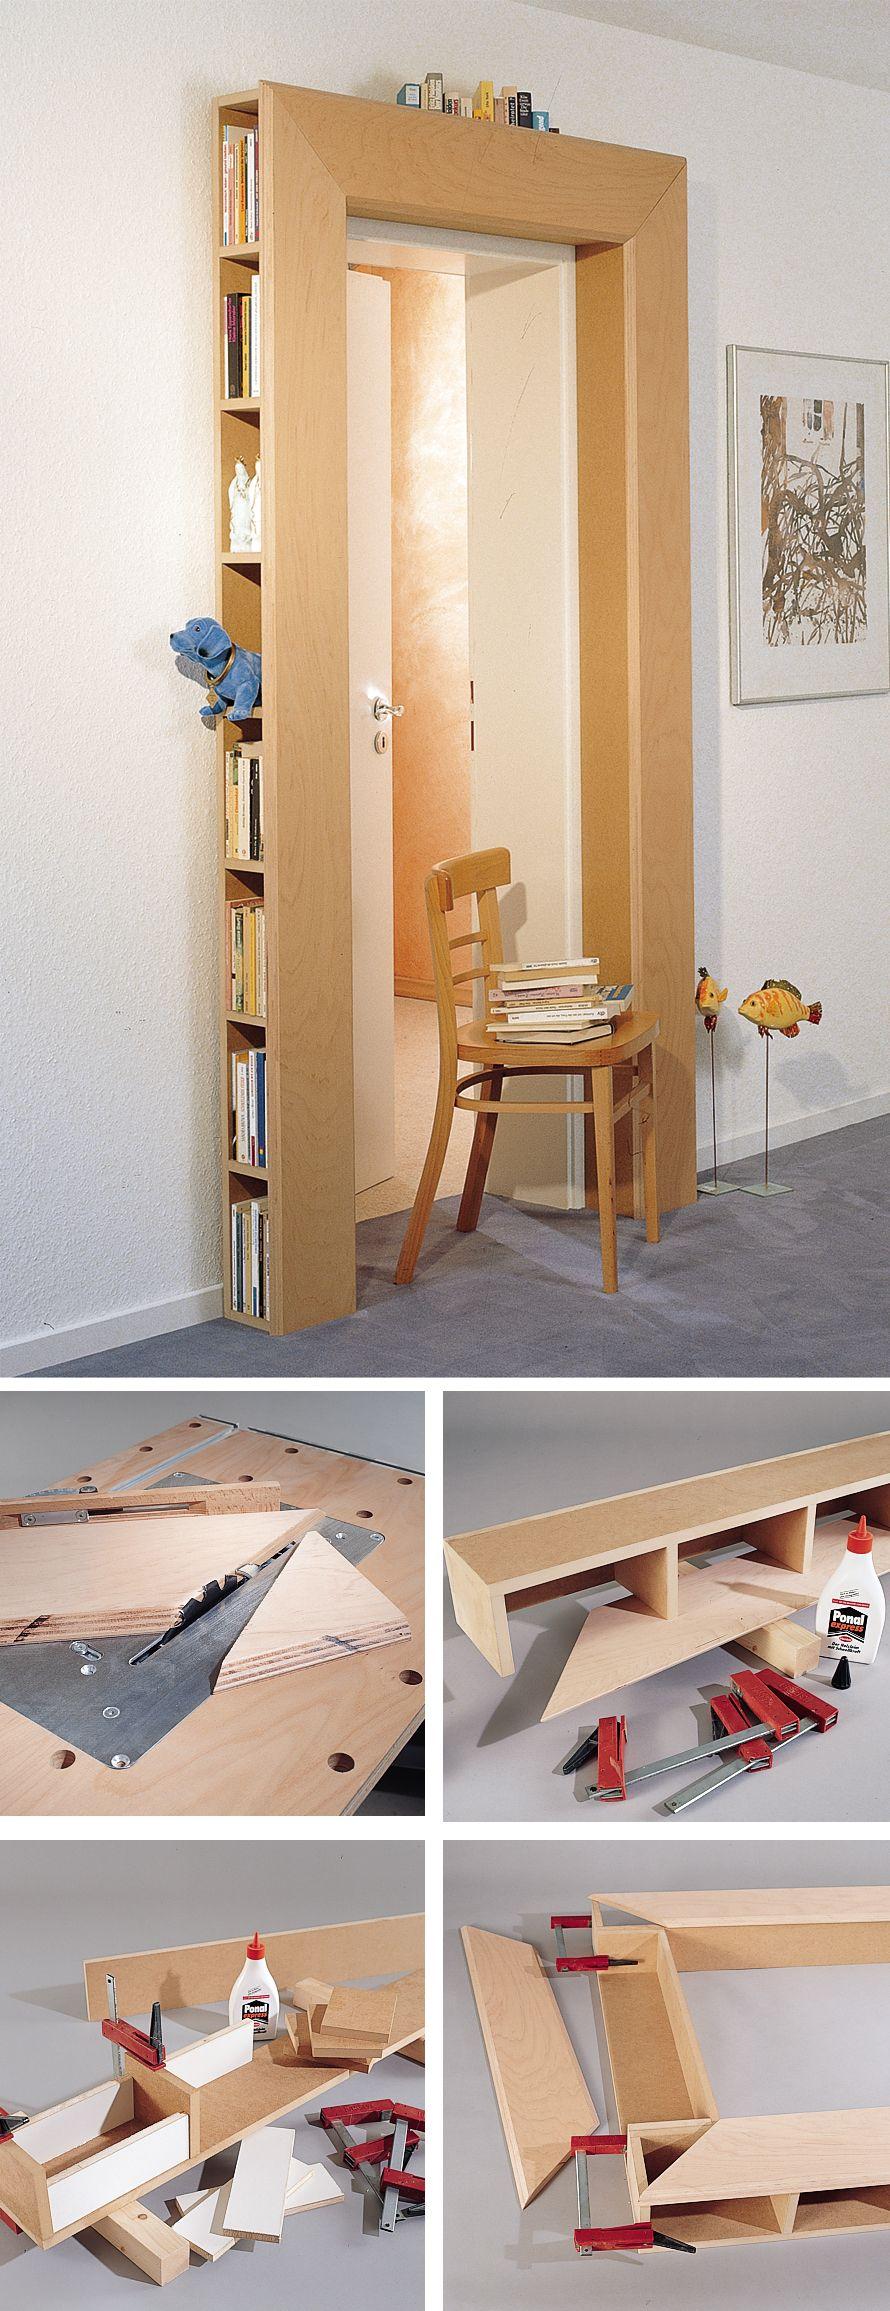 home-decor Ideas Bedroom Color Schemes is part of  - Libreria a ponte